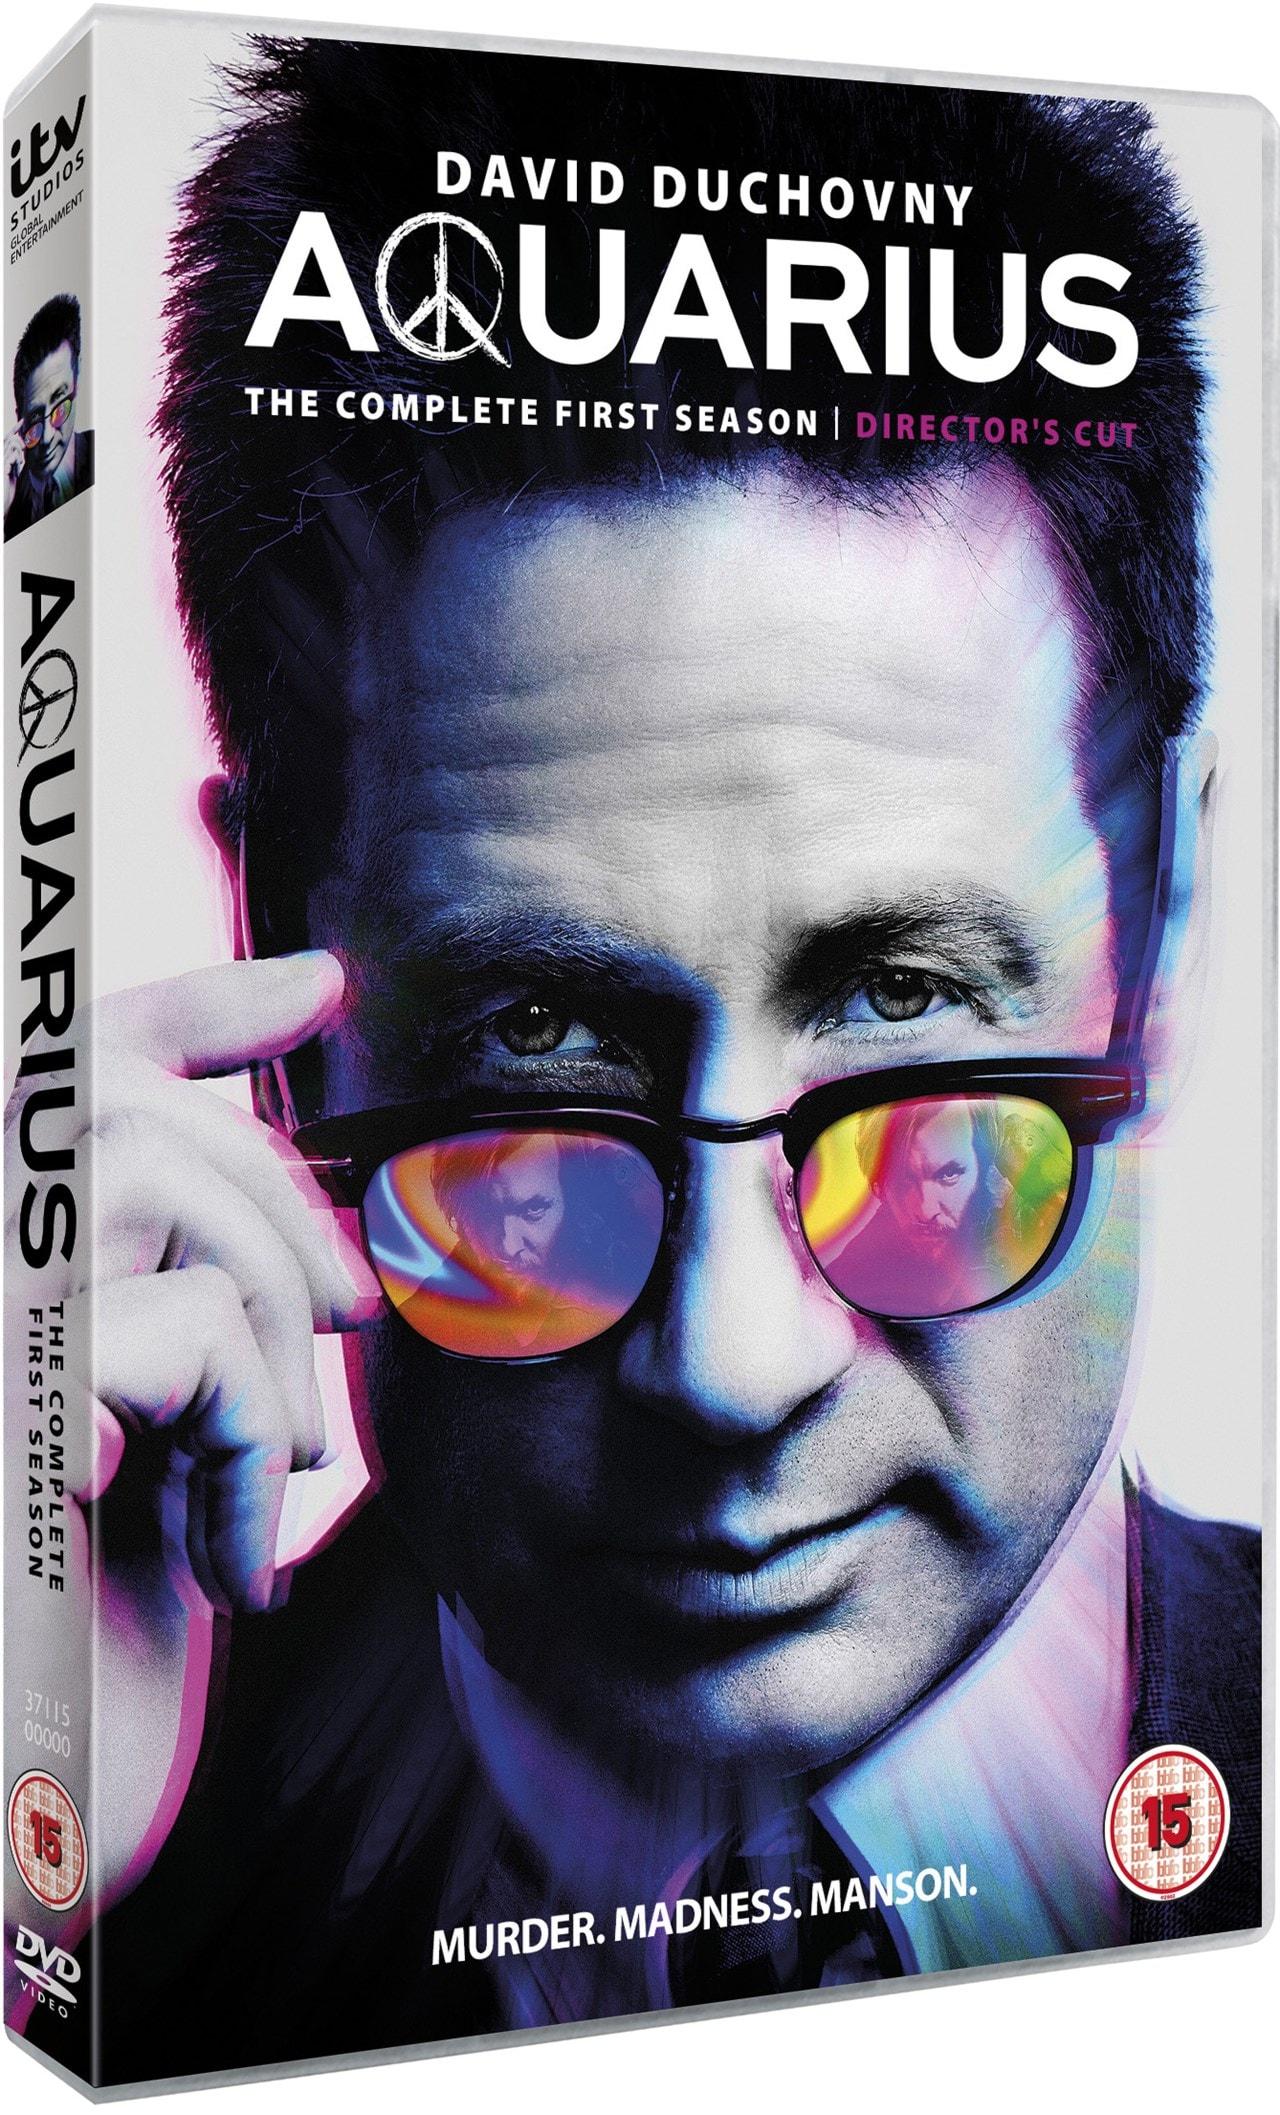 Aquarius: The Complete First Season - Director's Cut - 2